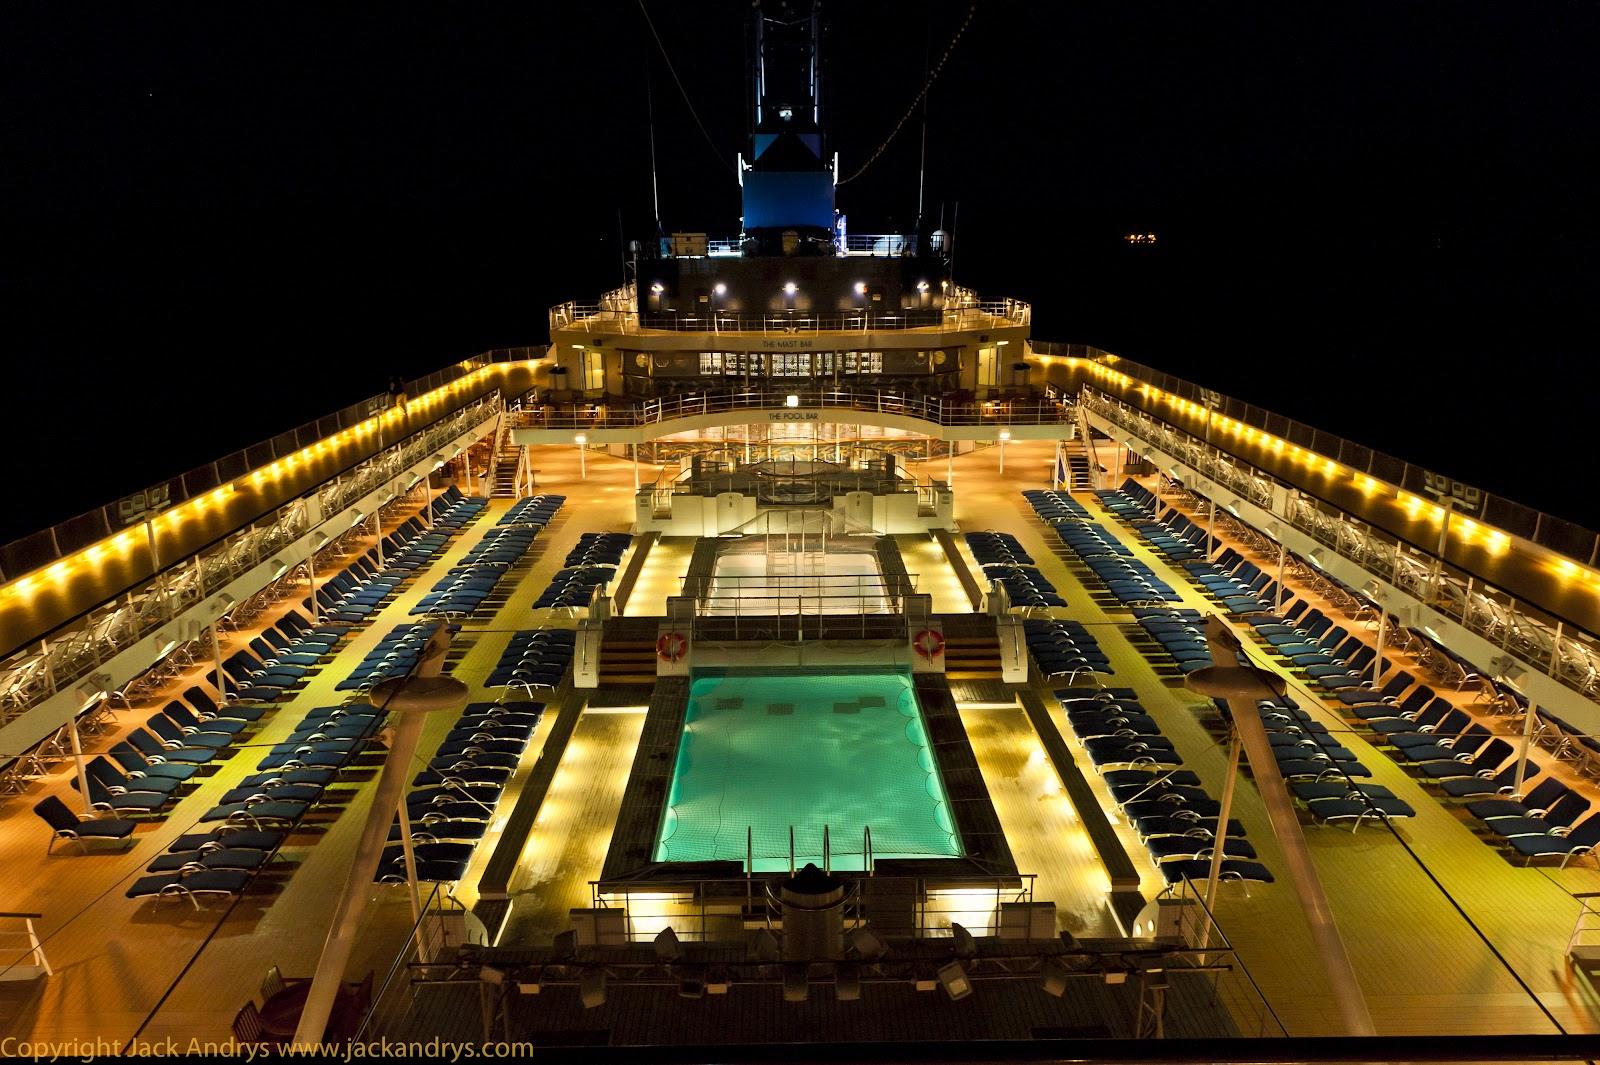 Inside Passage Cruise & Ports of Call - Princess Cruises